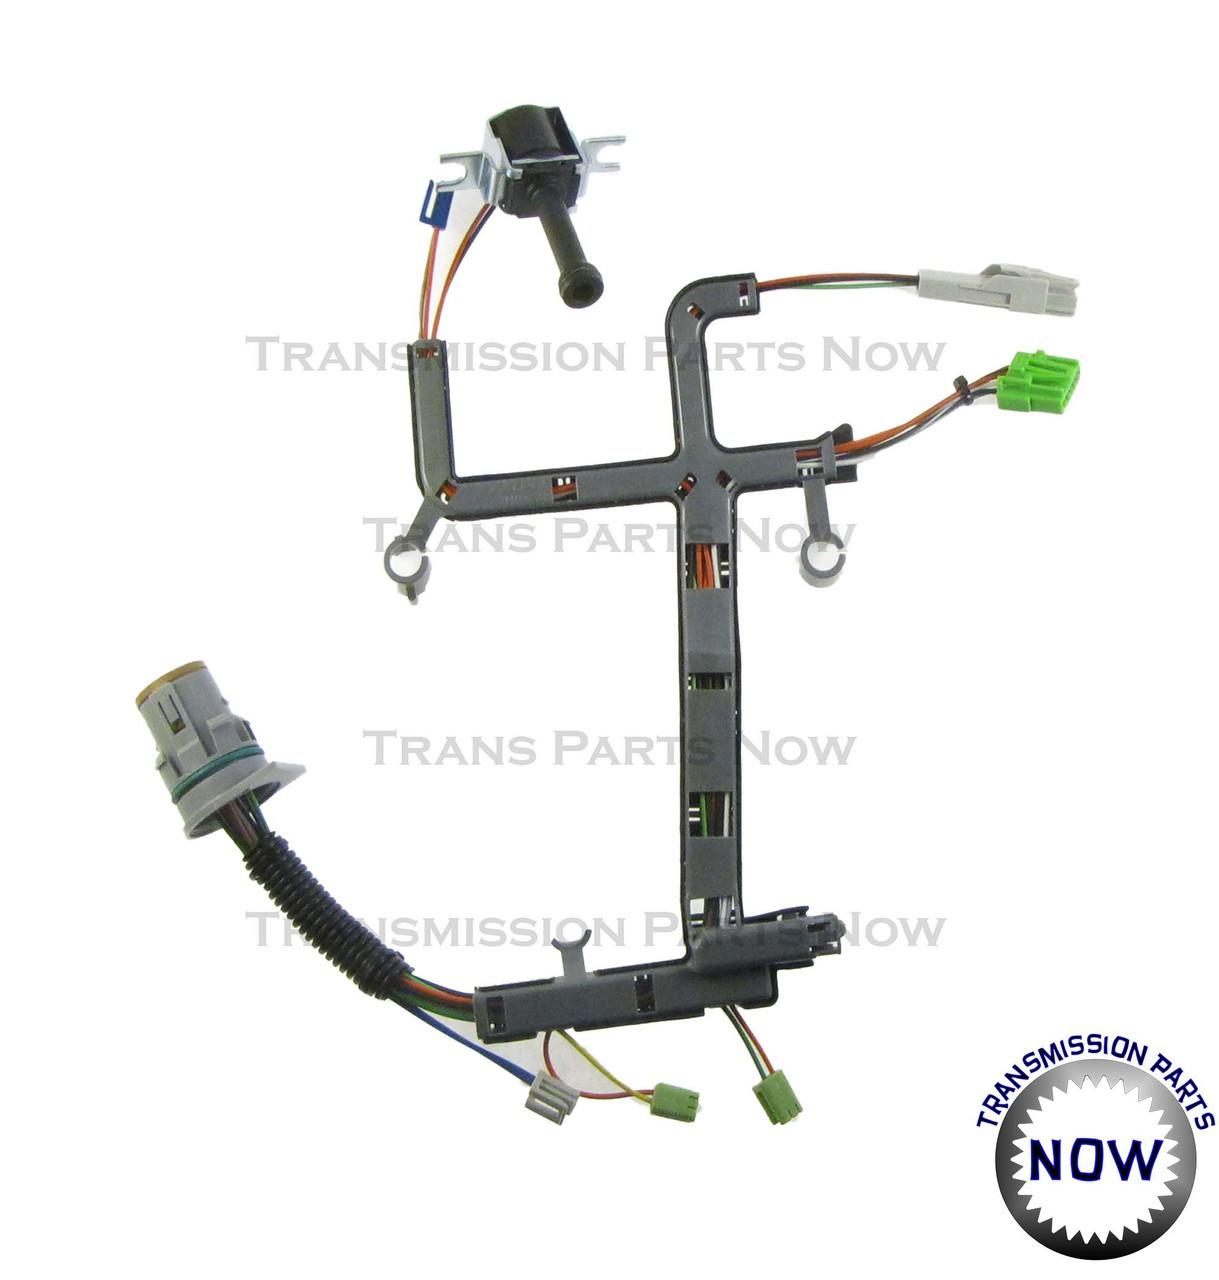 hight resolution of rostra 350 0152 4l65e 4l70e 2009 2012 wiring harness 4l65e wiring harness 4l65e wiring harness